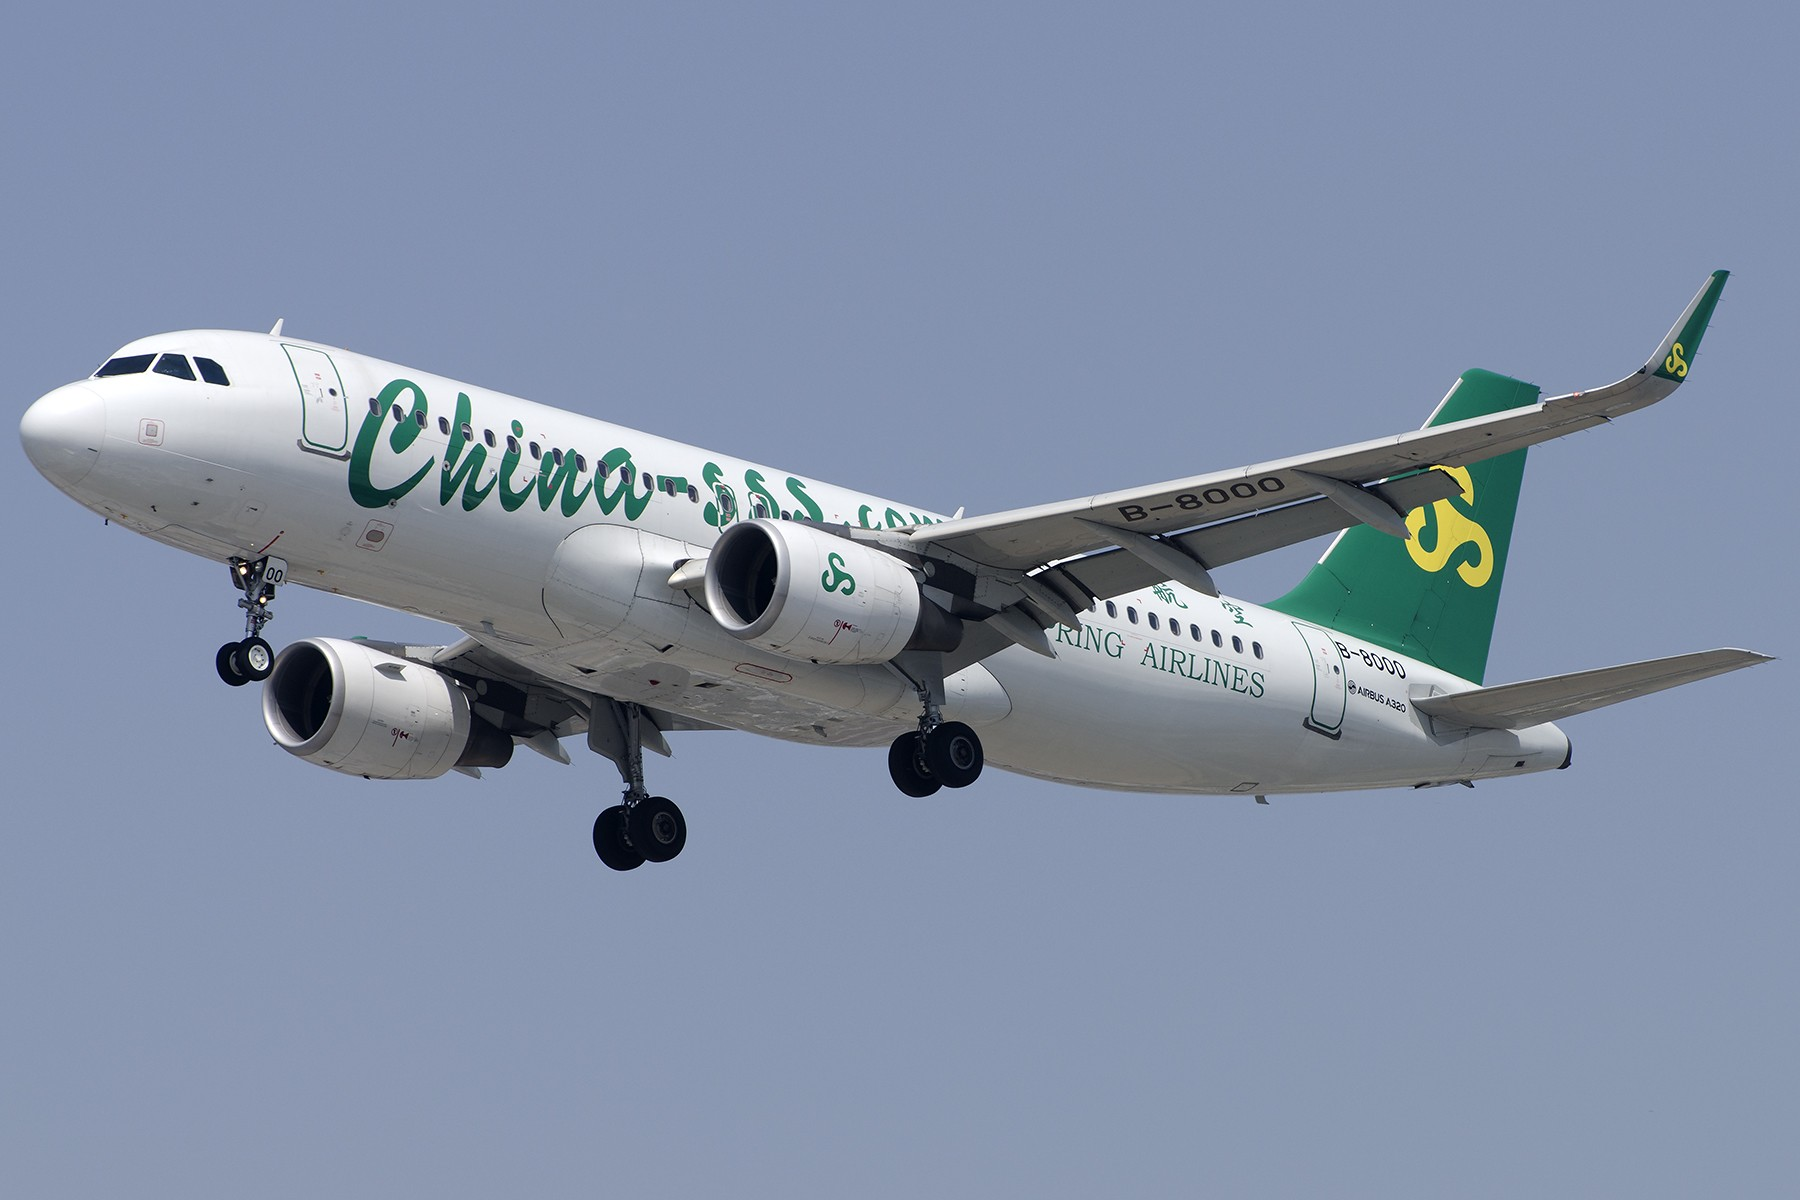 Re:[原创][原创]【SHA拍机*1800大图】4月拍的了,记得那天好货还挺多 AIRBUS A320-200 B-8000 中国上海虹桥国际机场